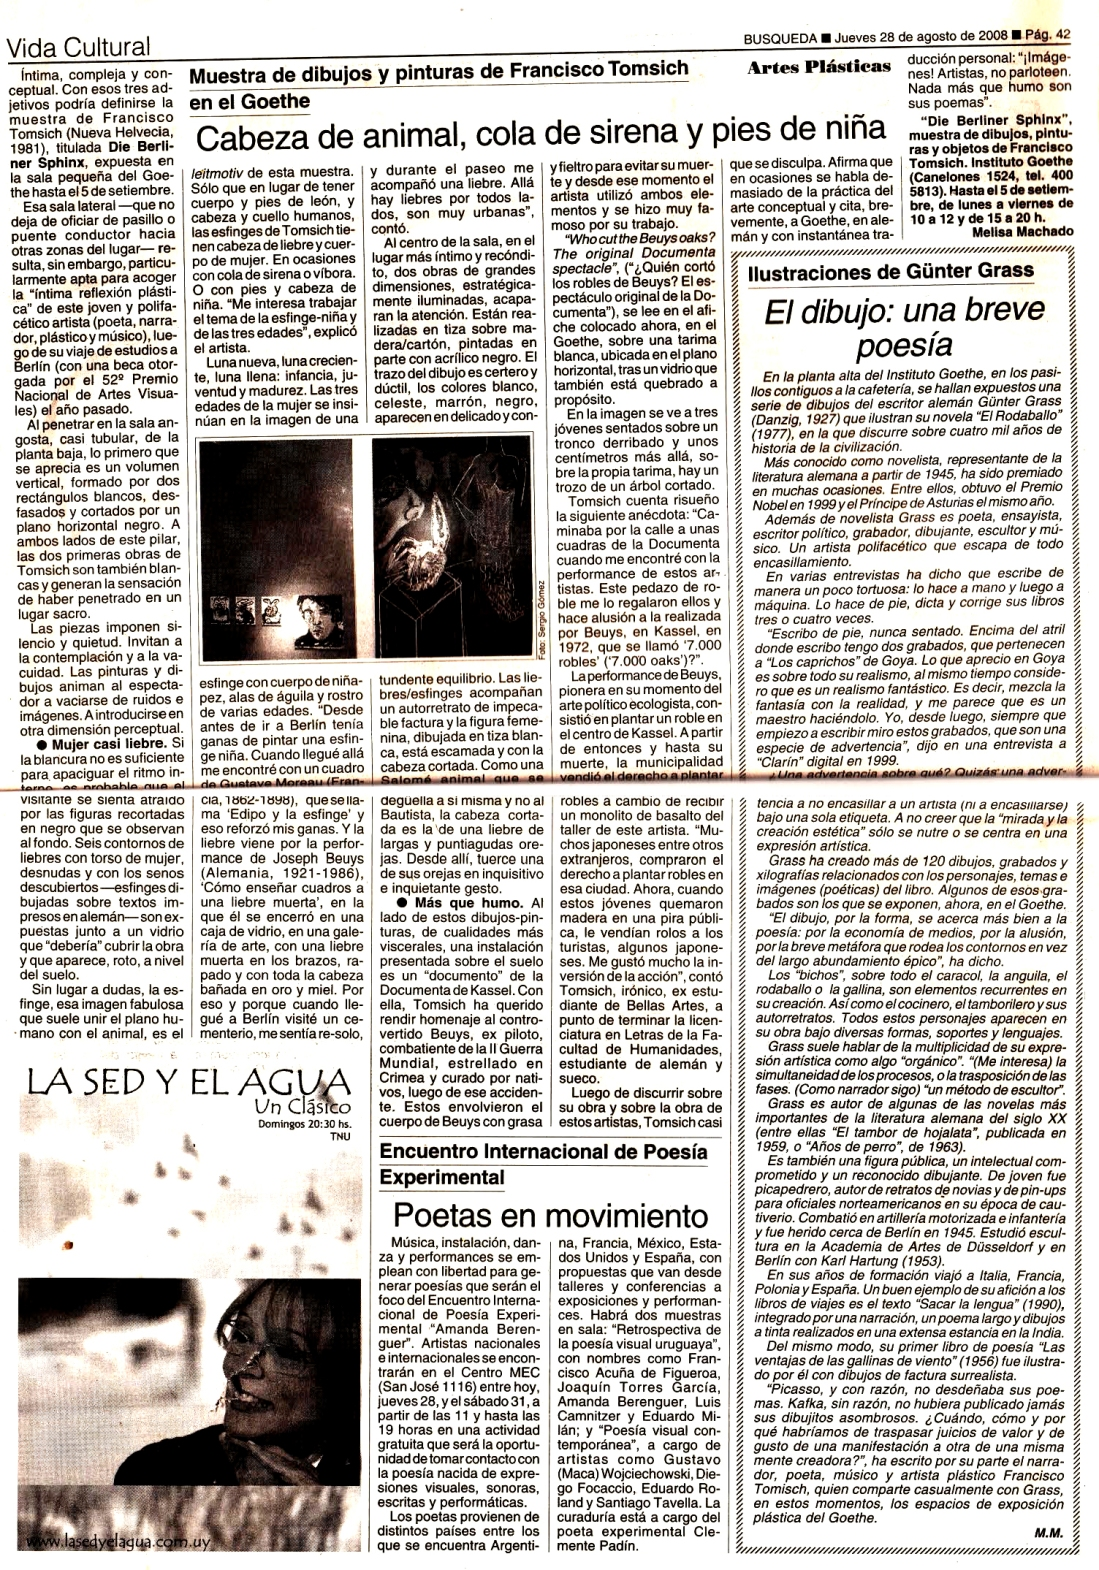 Reseña de Die Berliner Sphinx en Busqueda